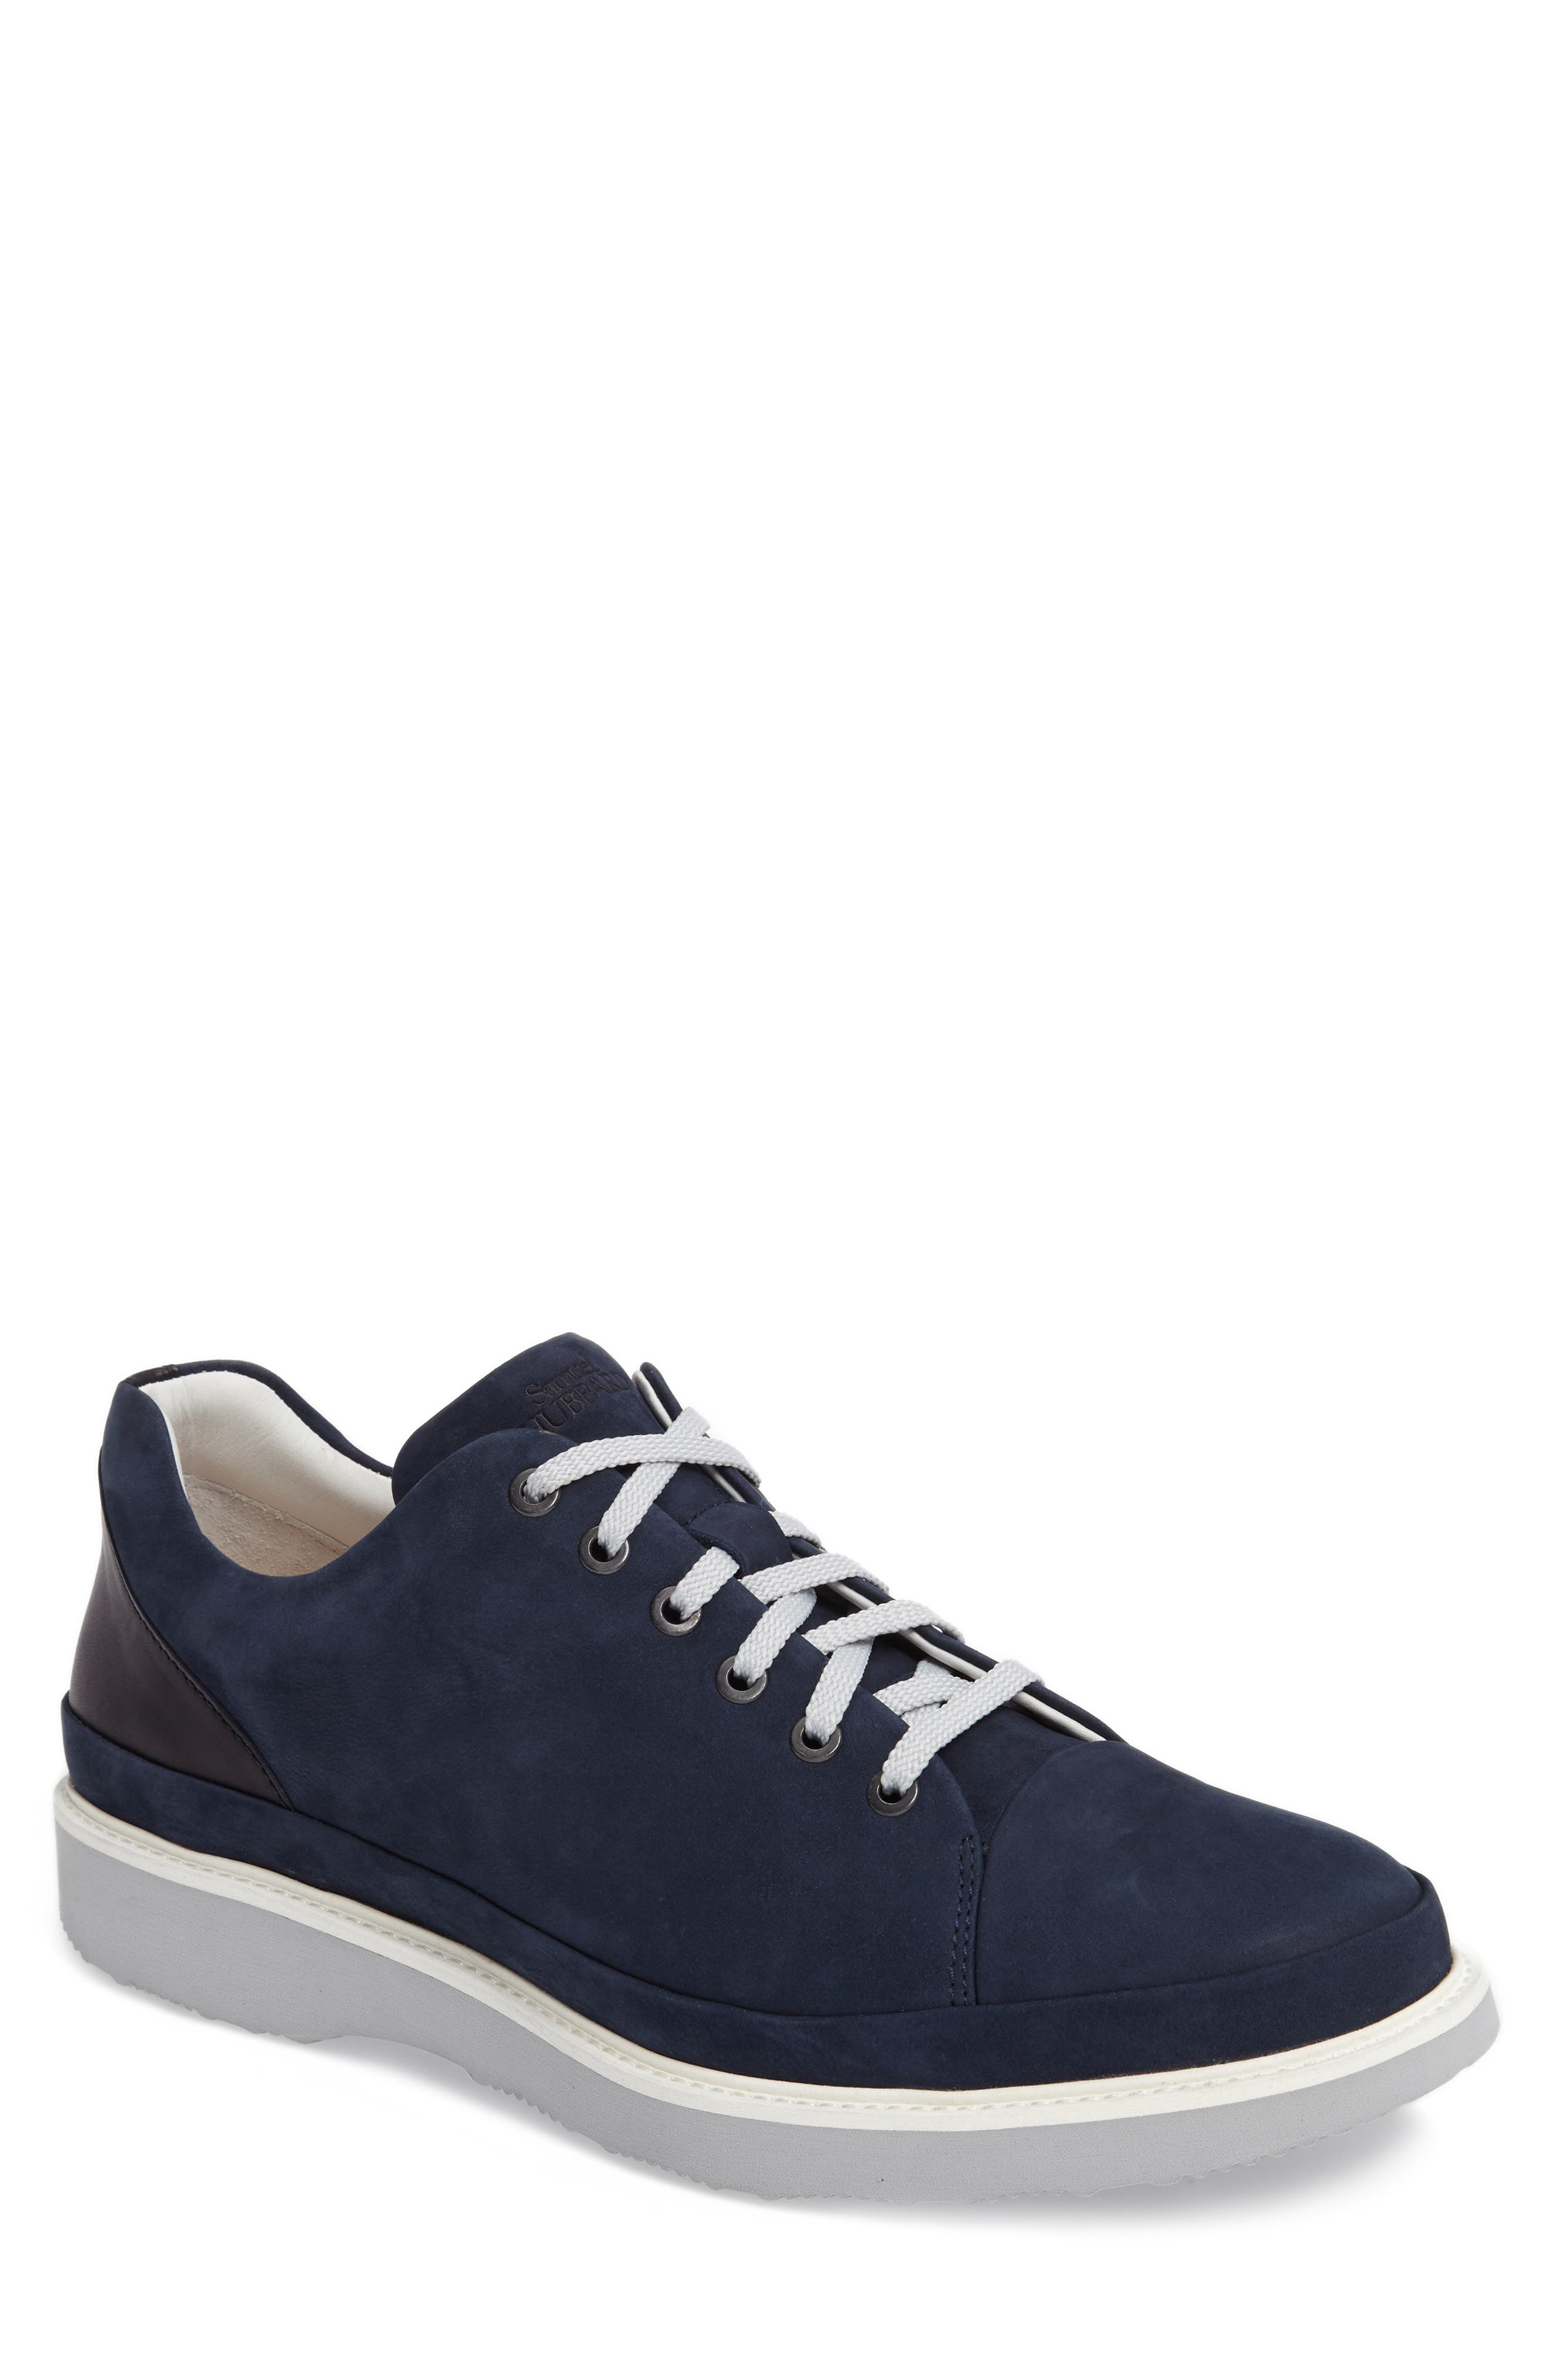 SAMUEL HUBBARD Sneaker